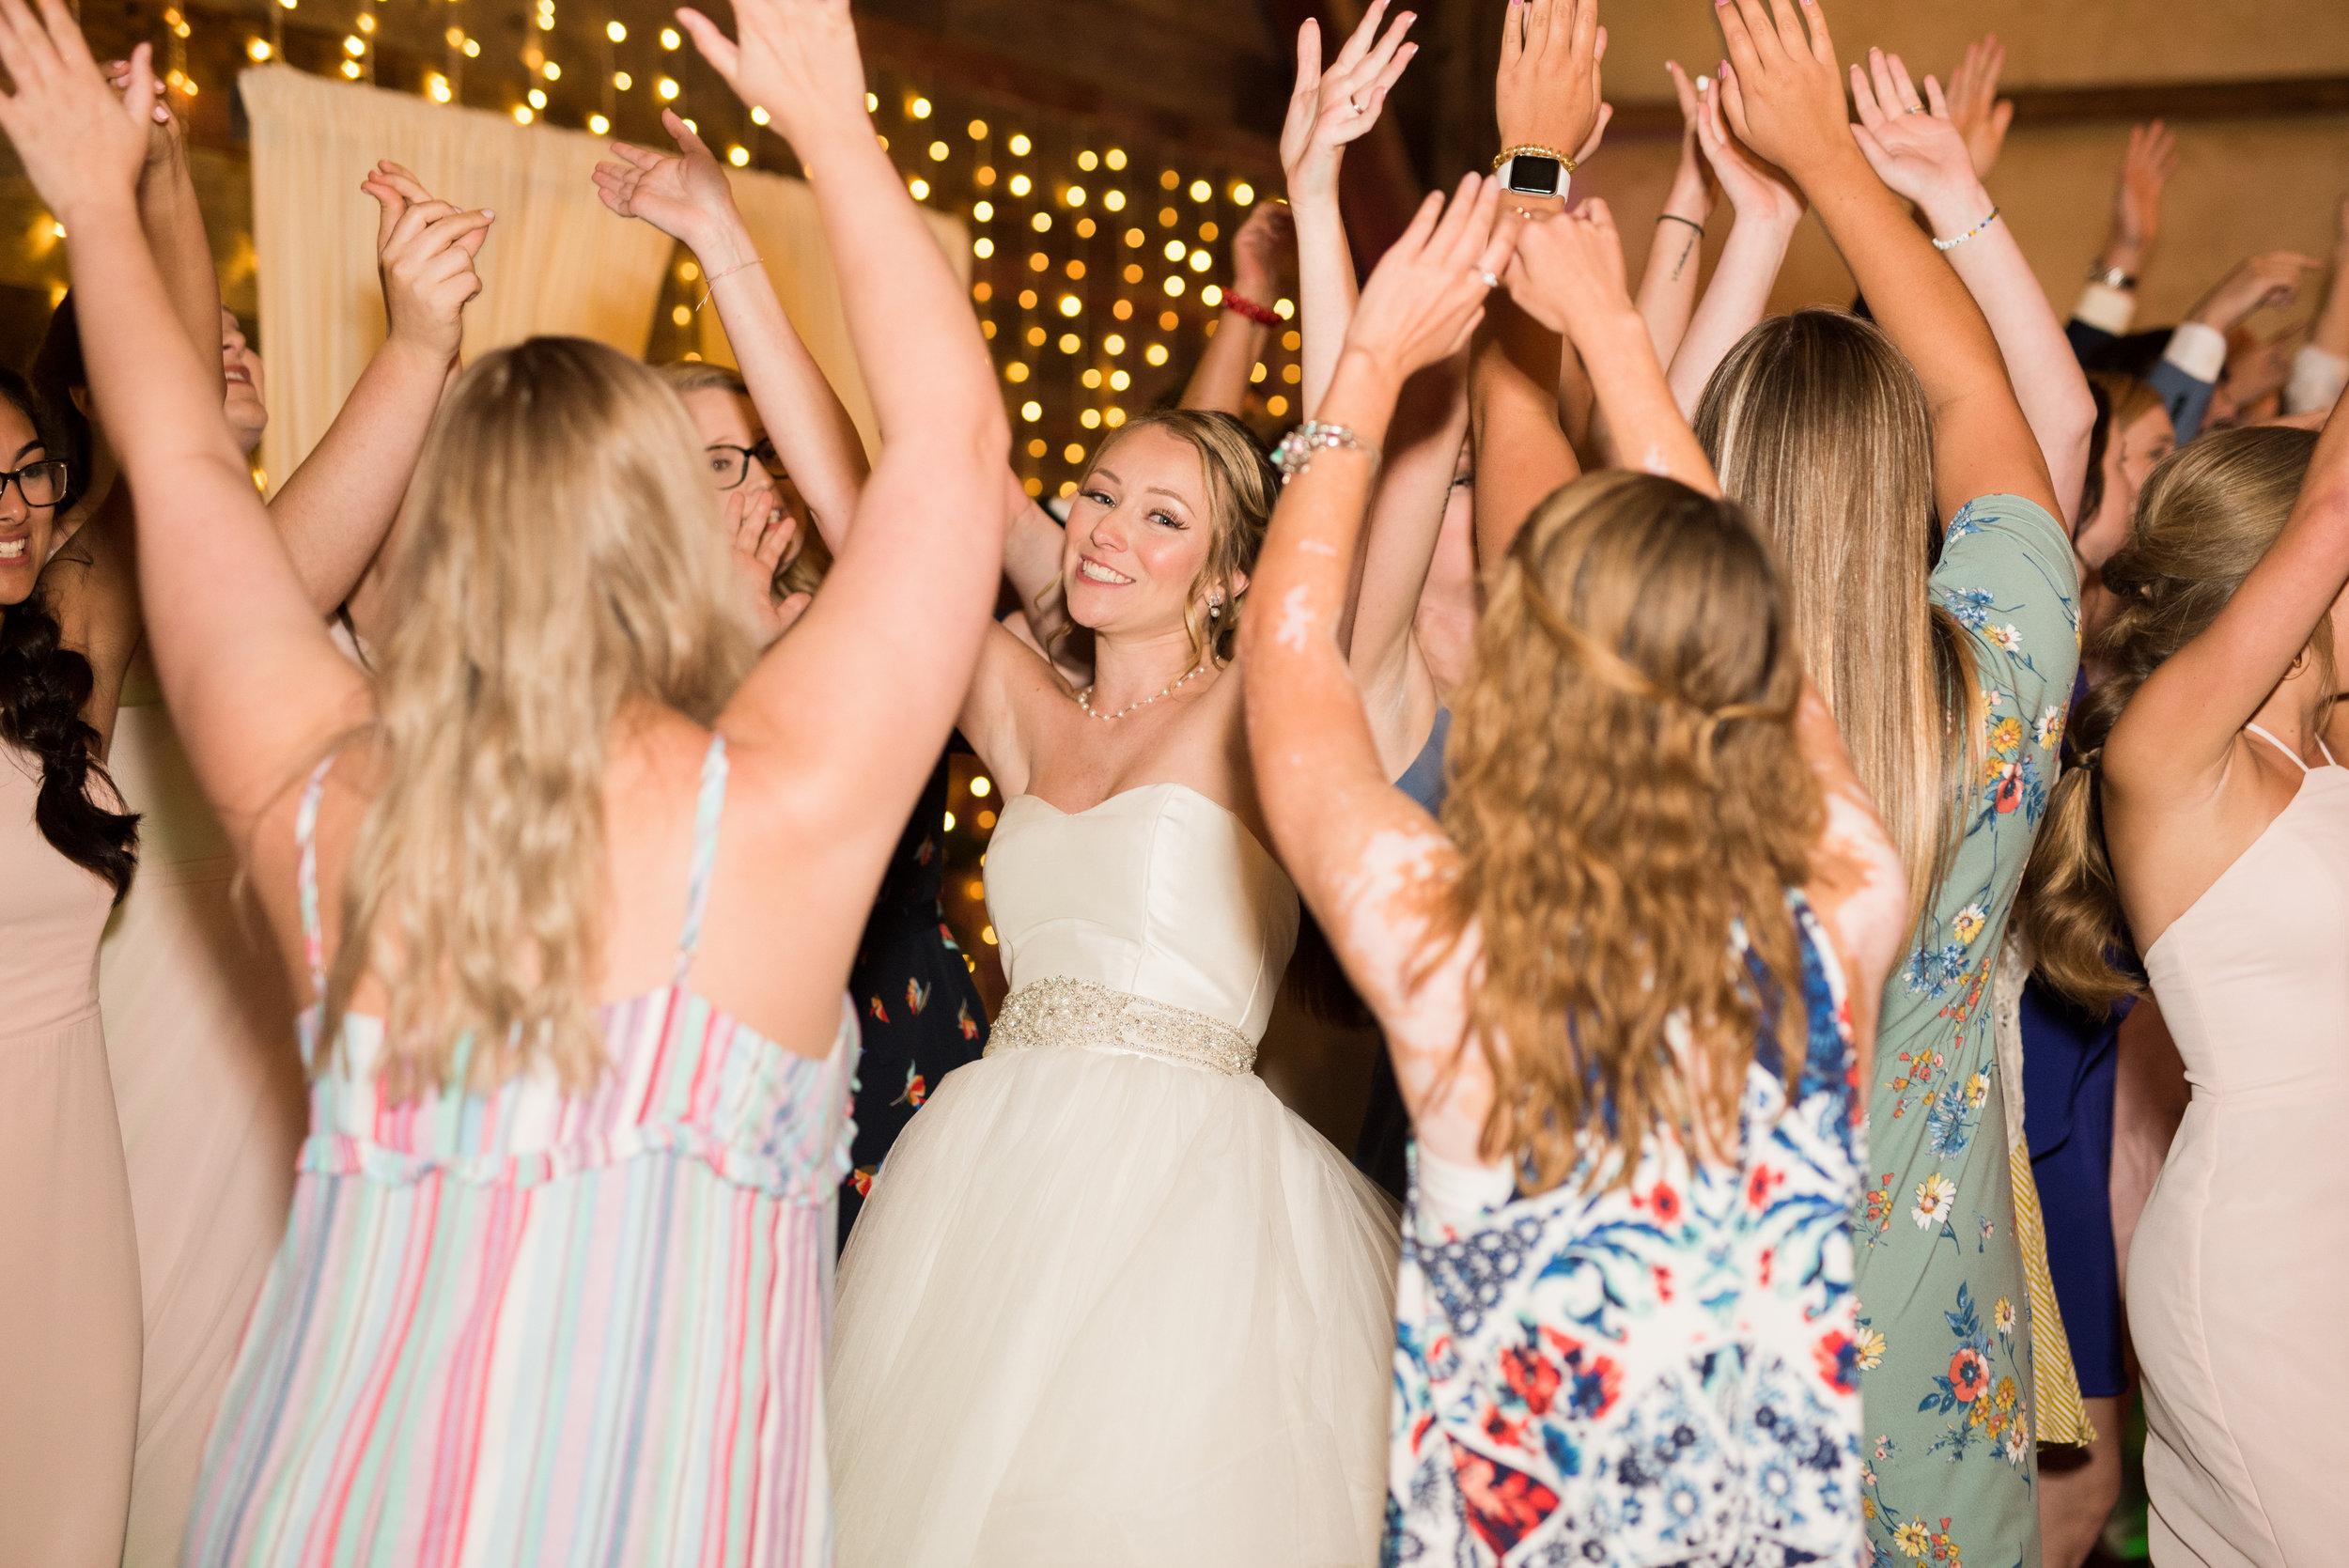 The Barn at Bridlewood wedding in Hattiesburg, Mississippi (MS) in June | Wedding Reception